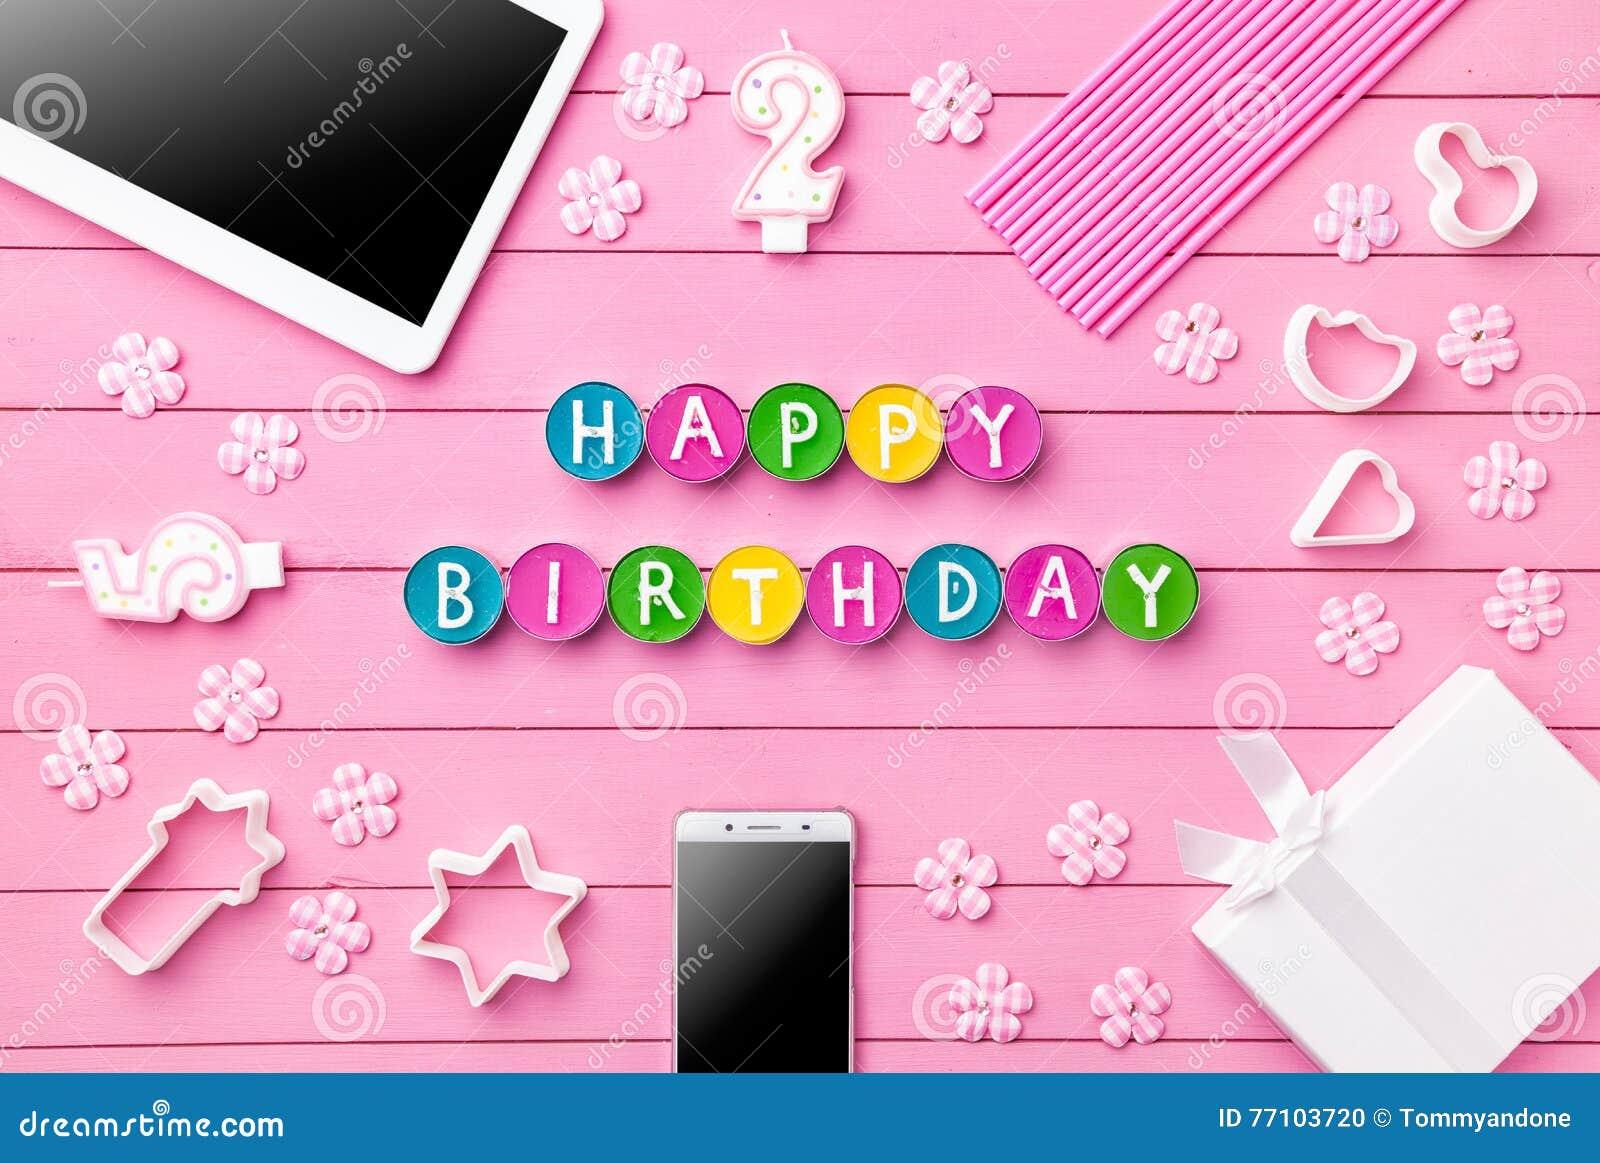 colorful happy birthday background stock photo image of girl